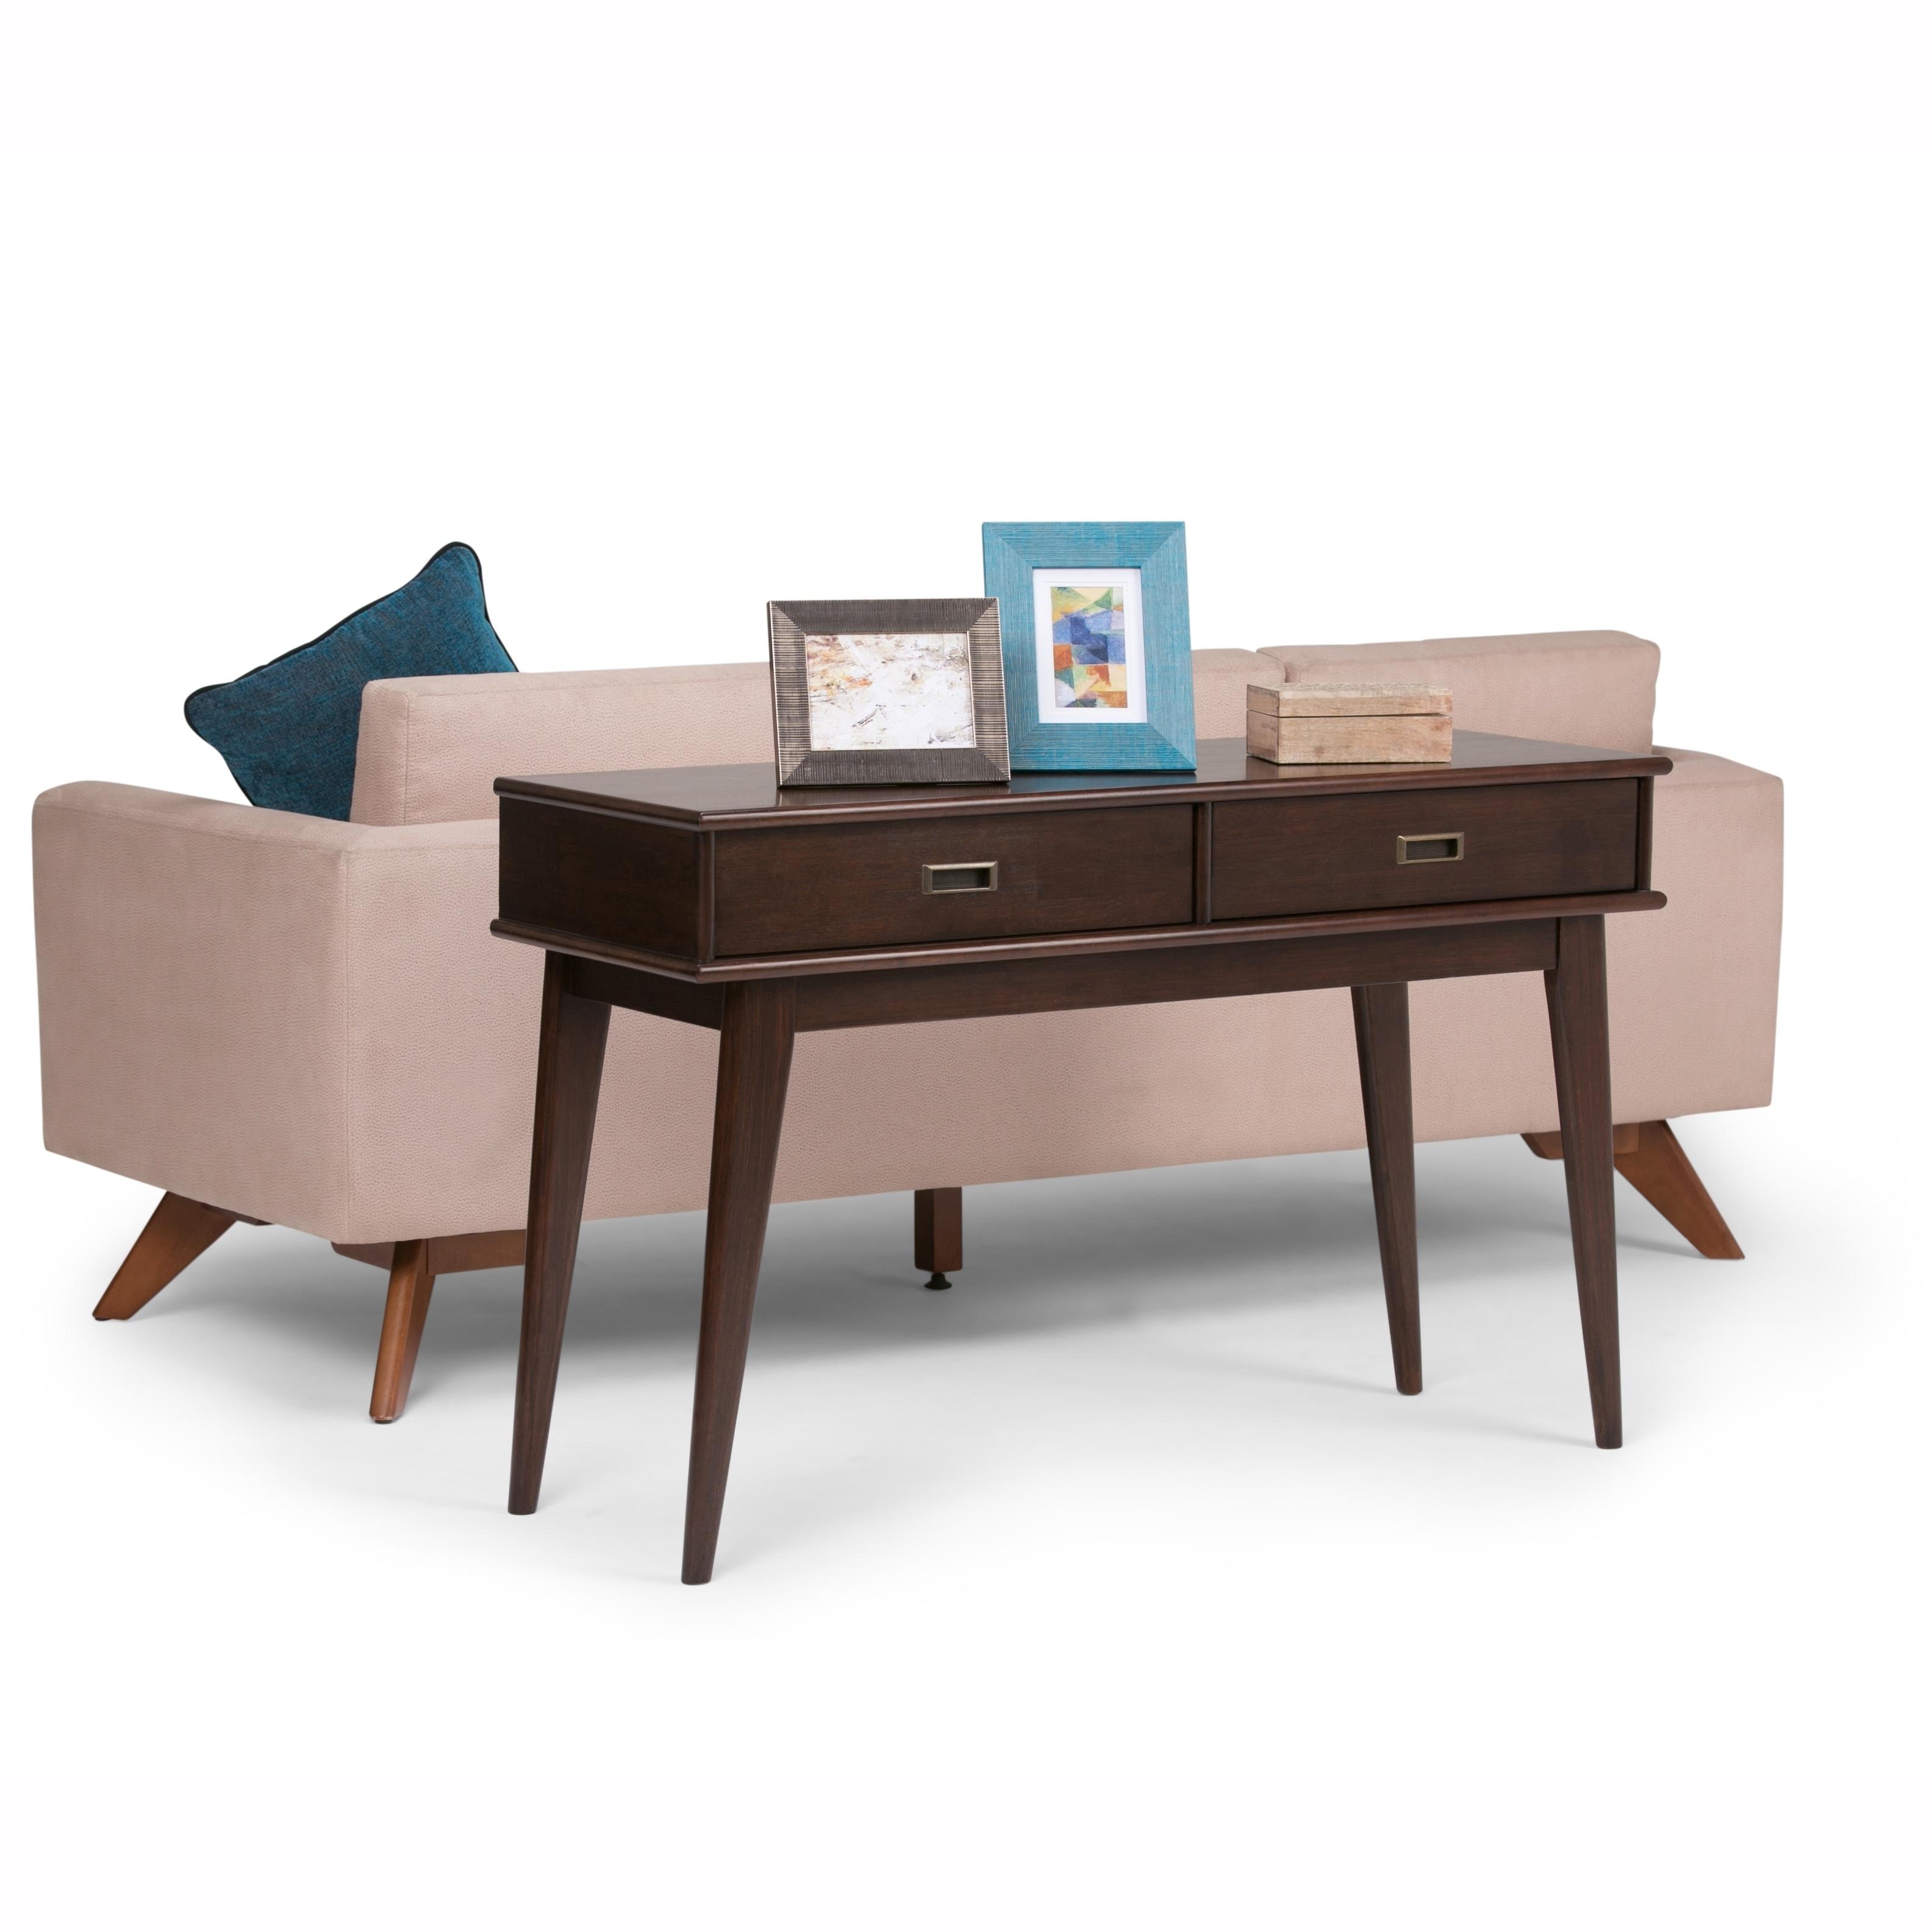 WYNDENHALL Tierney Solid Hardwood 48 inch Wide Mid Century Modern Console  Sofa Table - 48 W x 16 D x 30 H